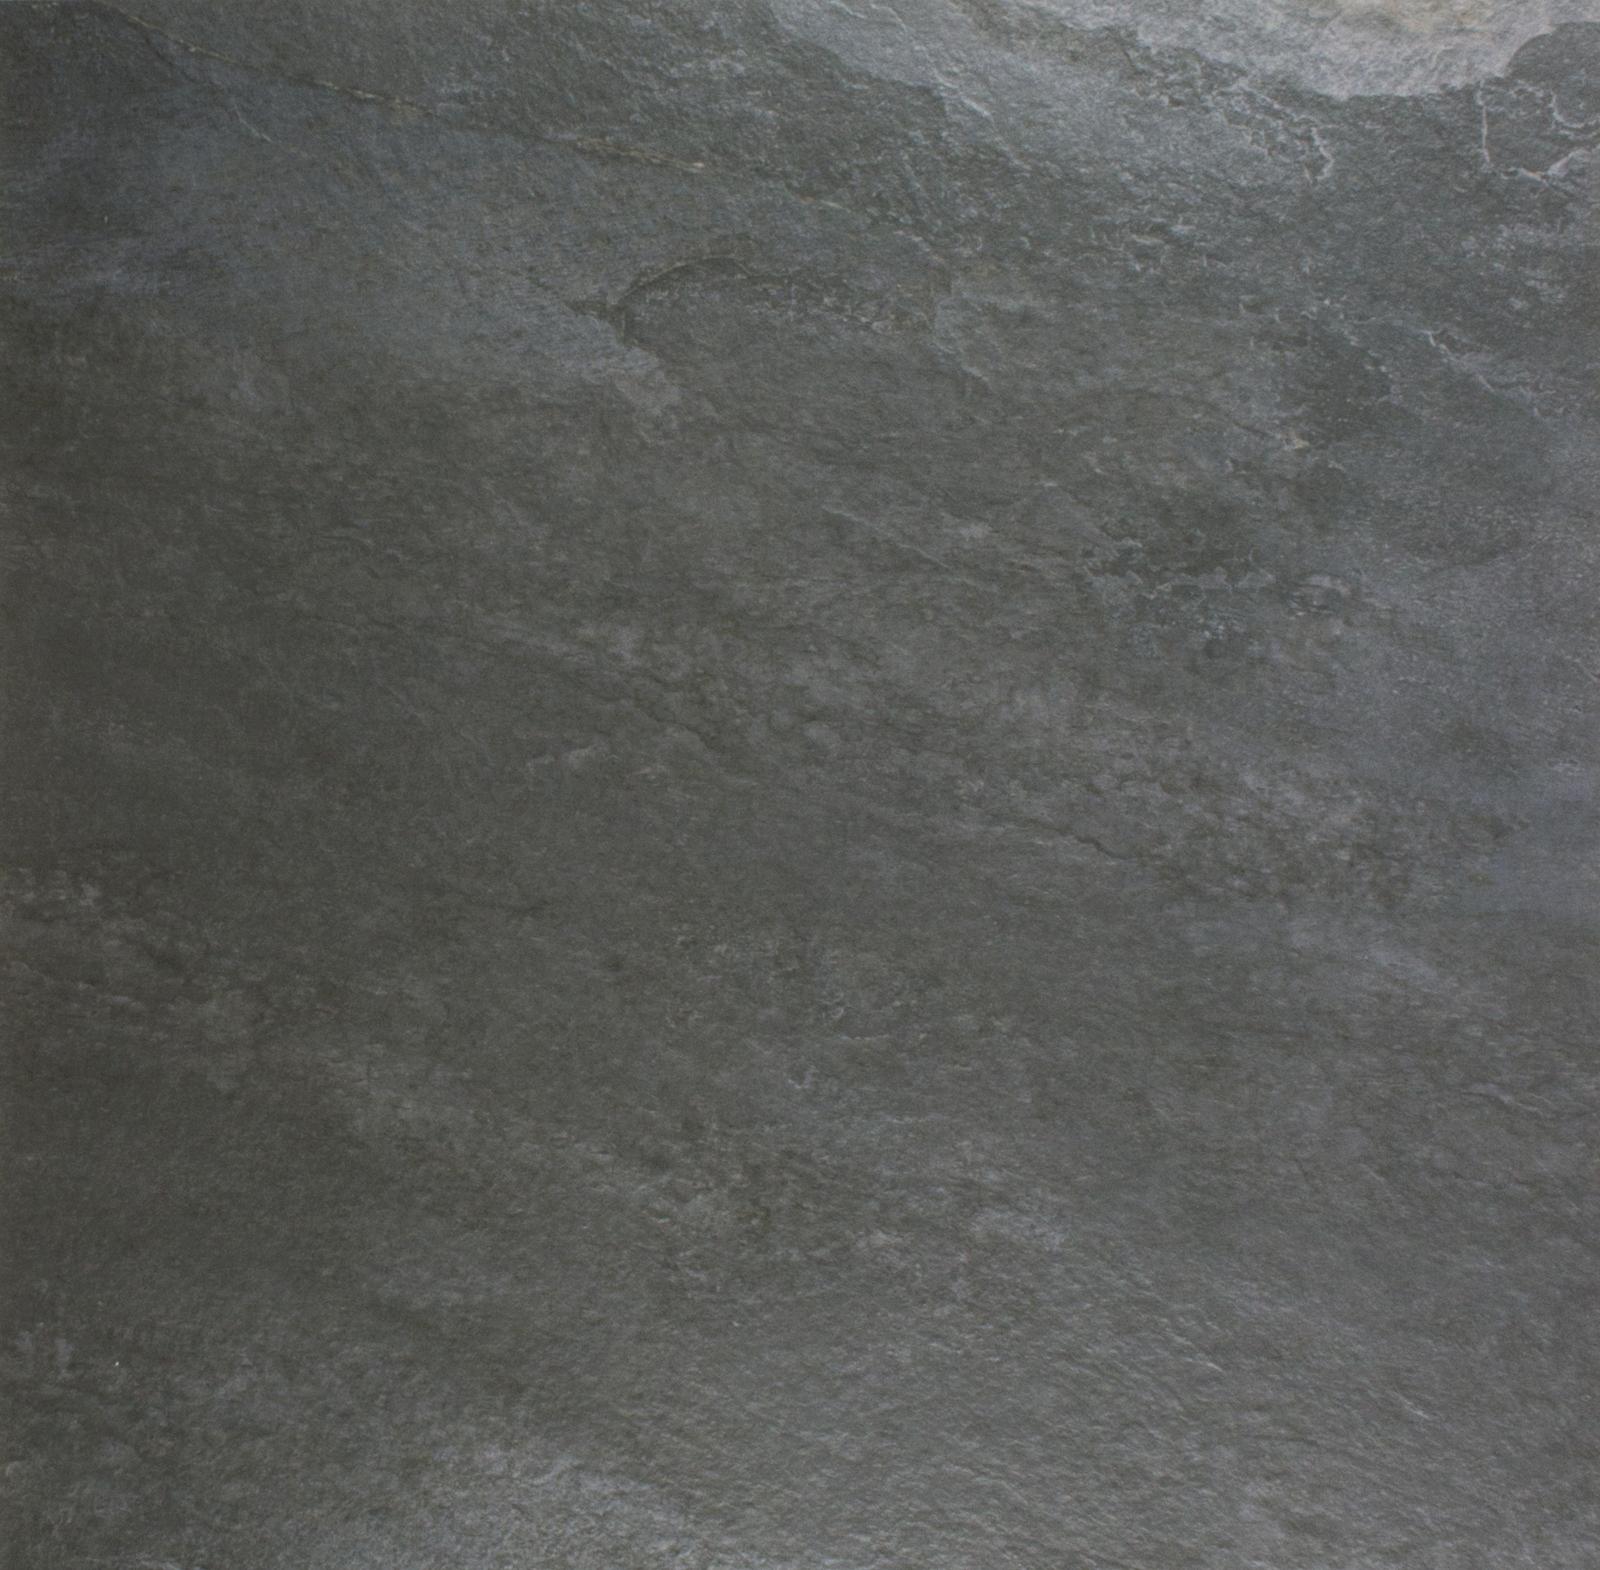 Bathroom Slate Floor Tiles Gallery Tile Flooring Design Ideas